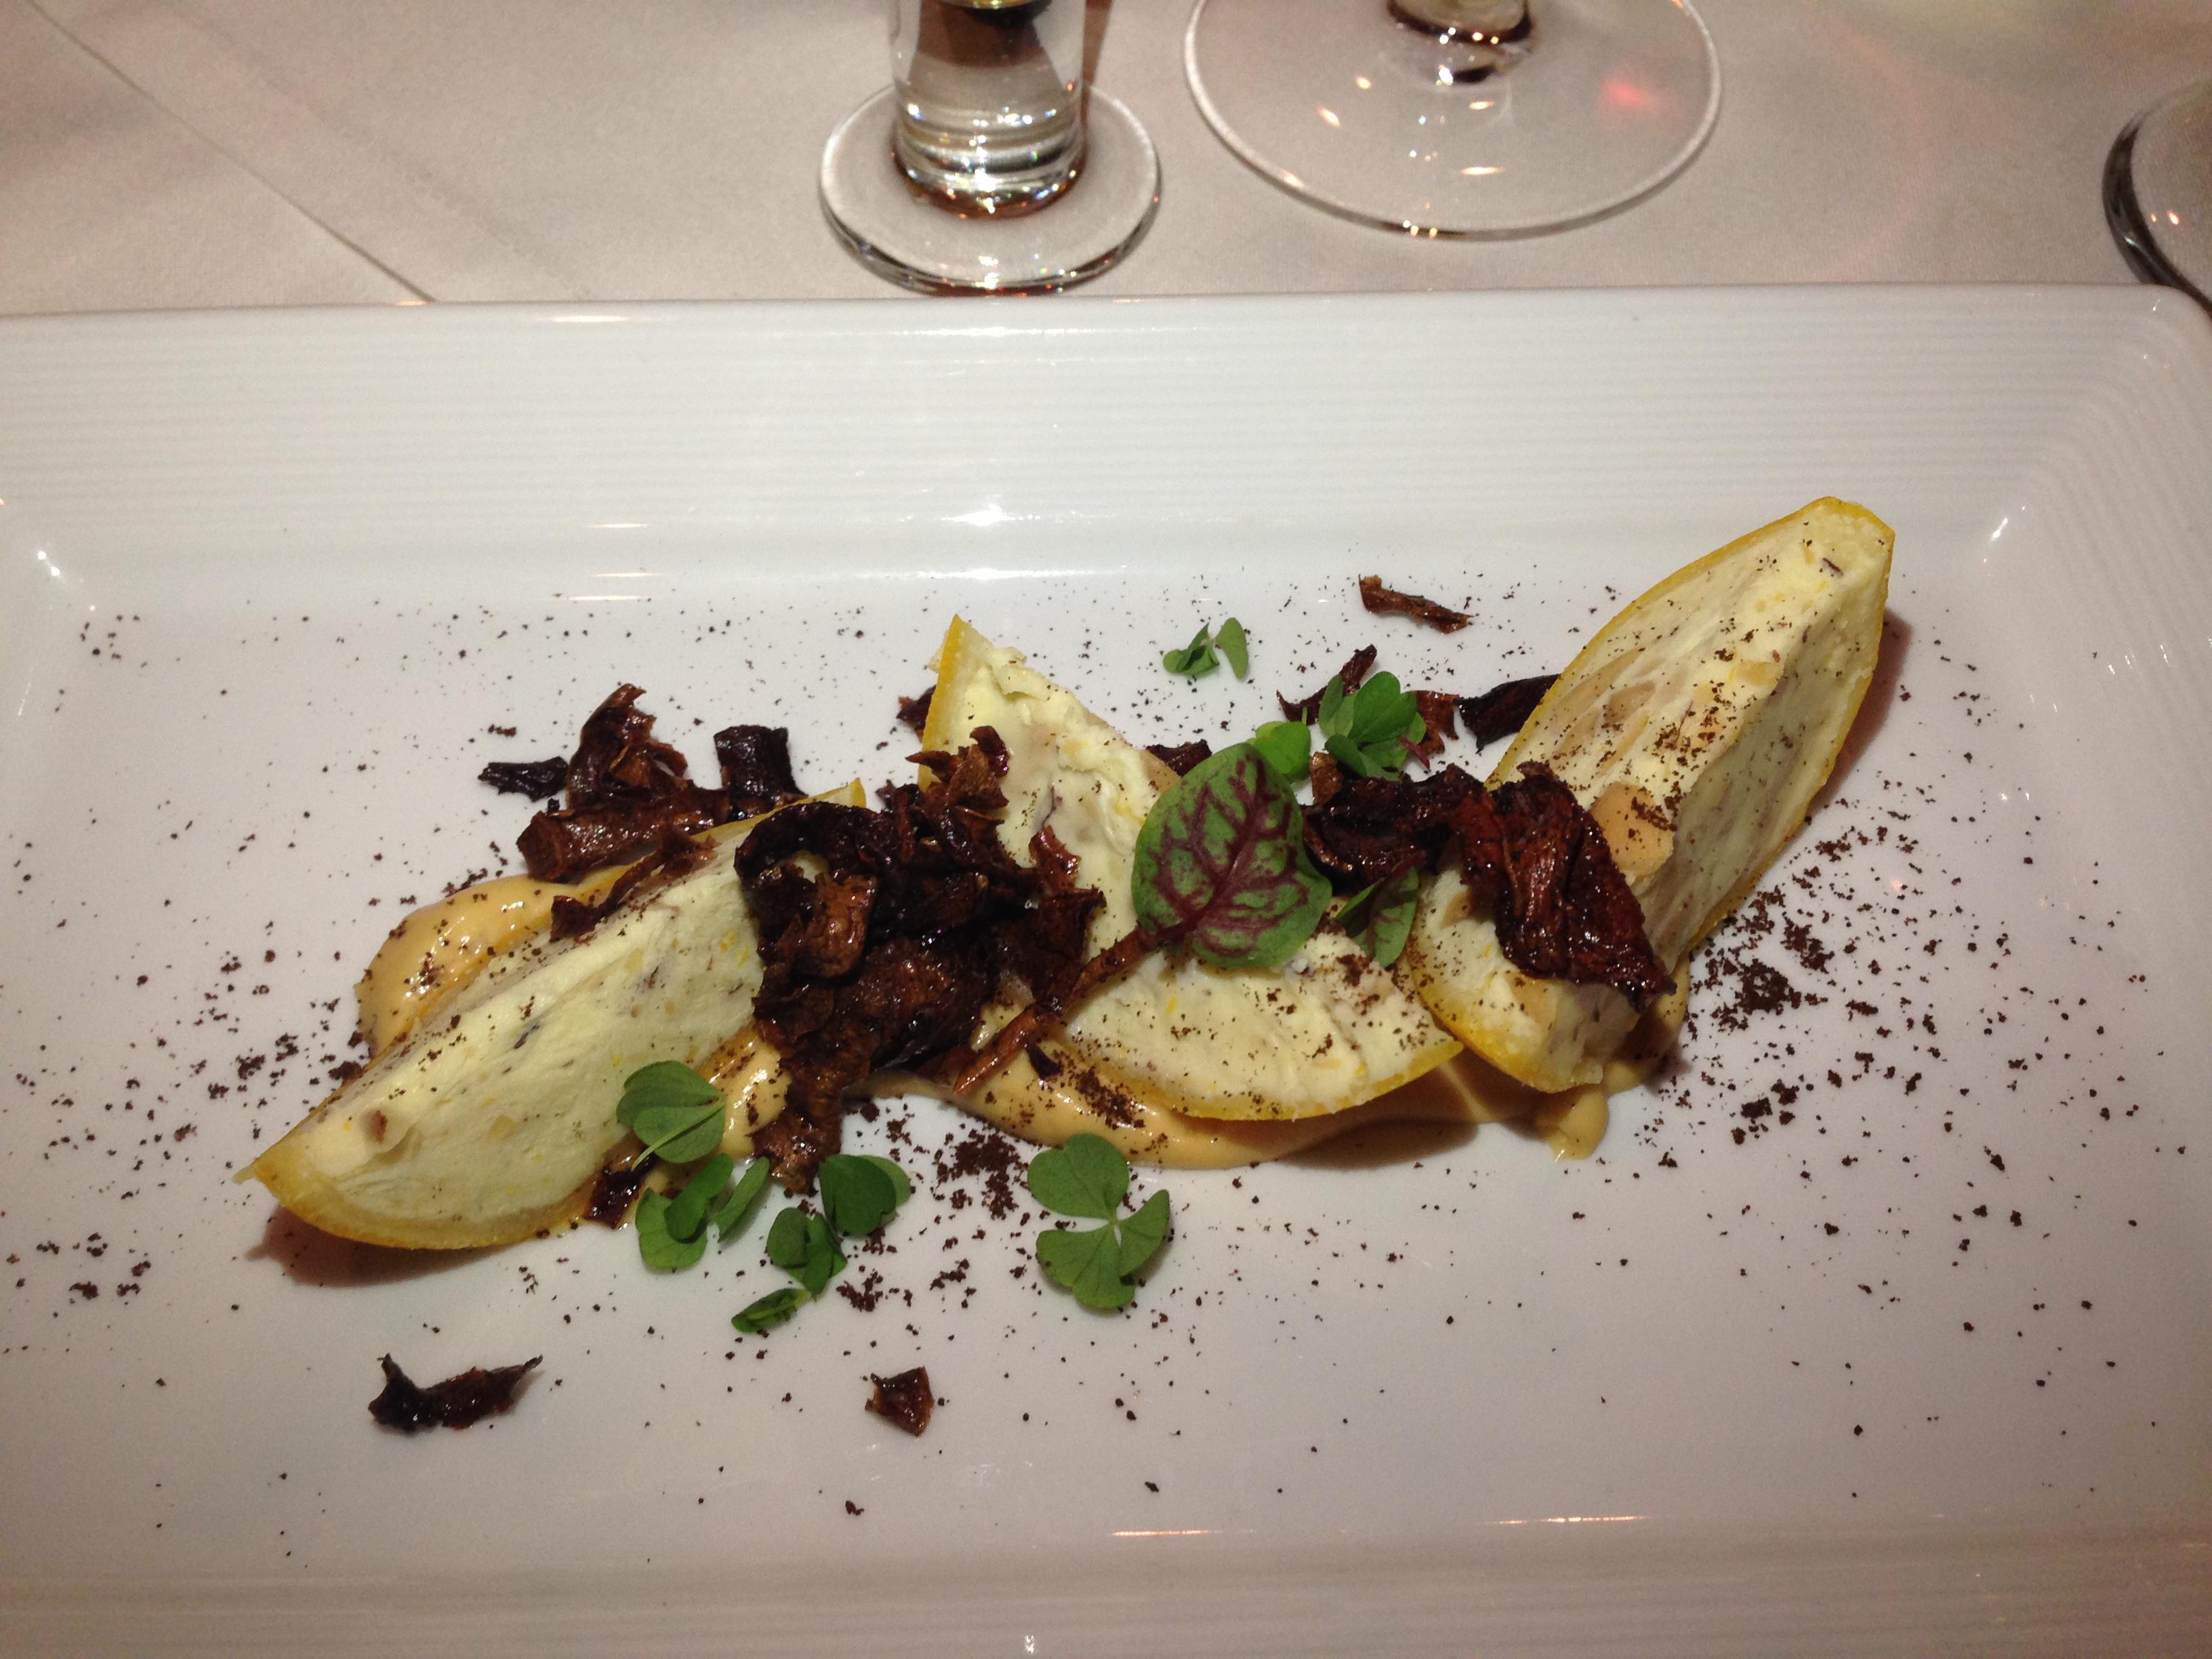 Torino's chef Garrett Lipar prepared a dish featuring Meyer lemon, Brazil nut, and parsnip.